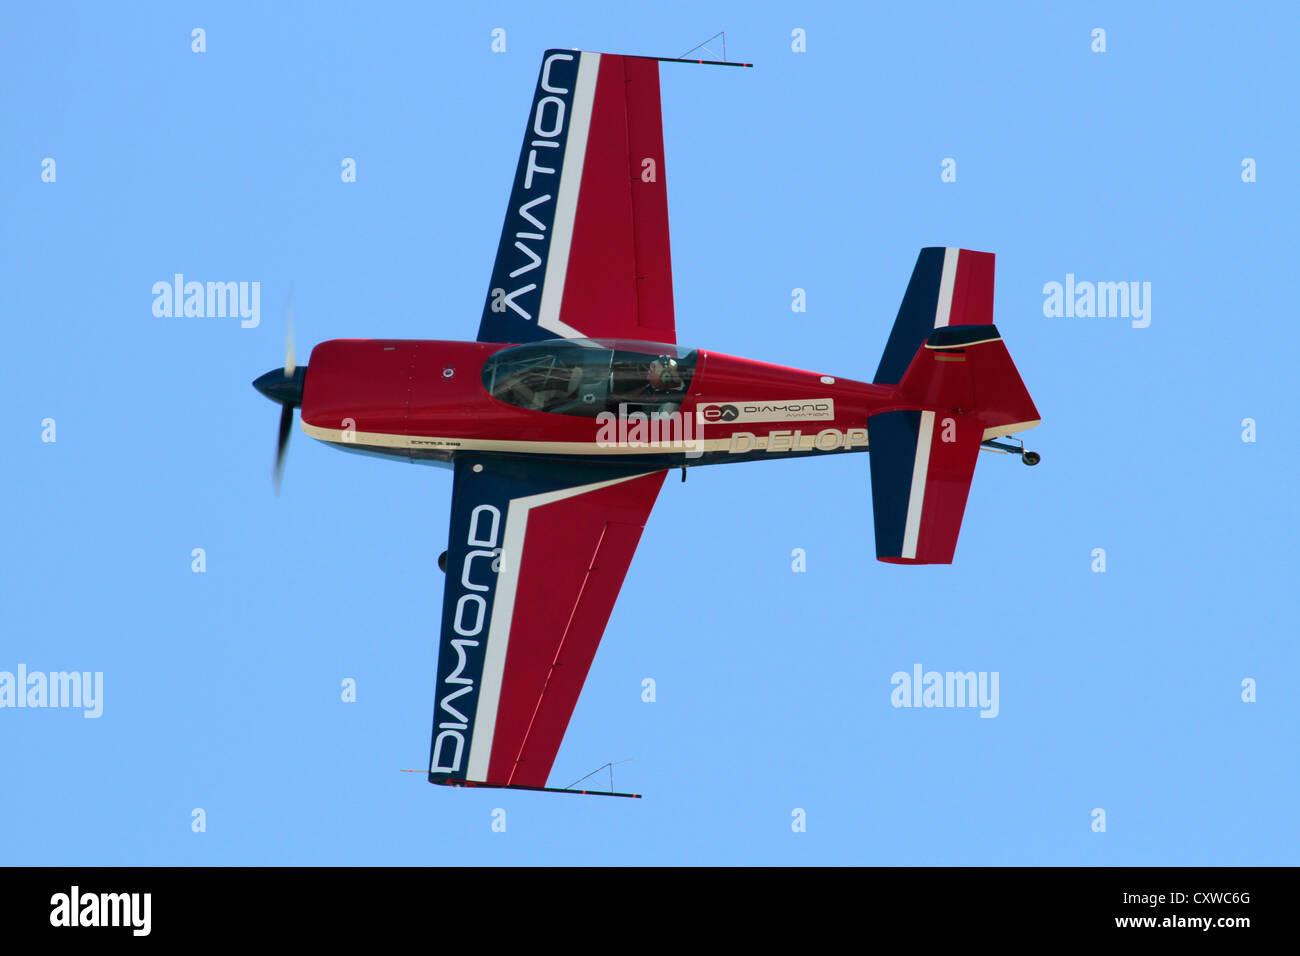 Extra 200 light aerobatic and racing plane during an air display - Stock Image